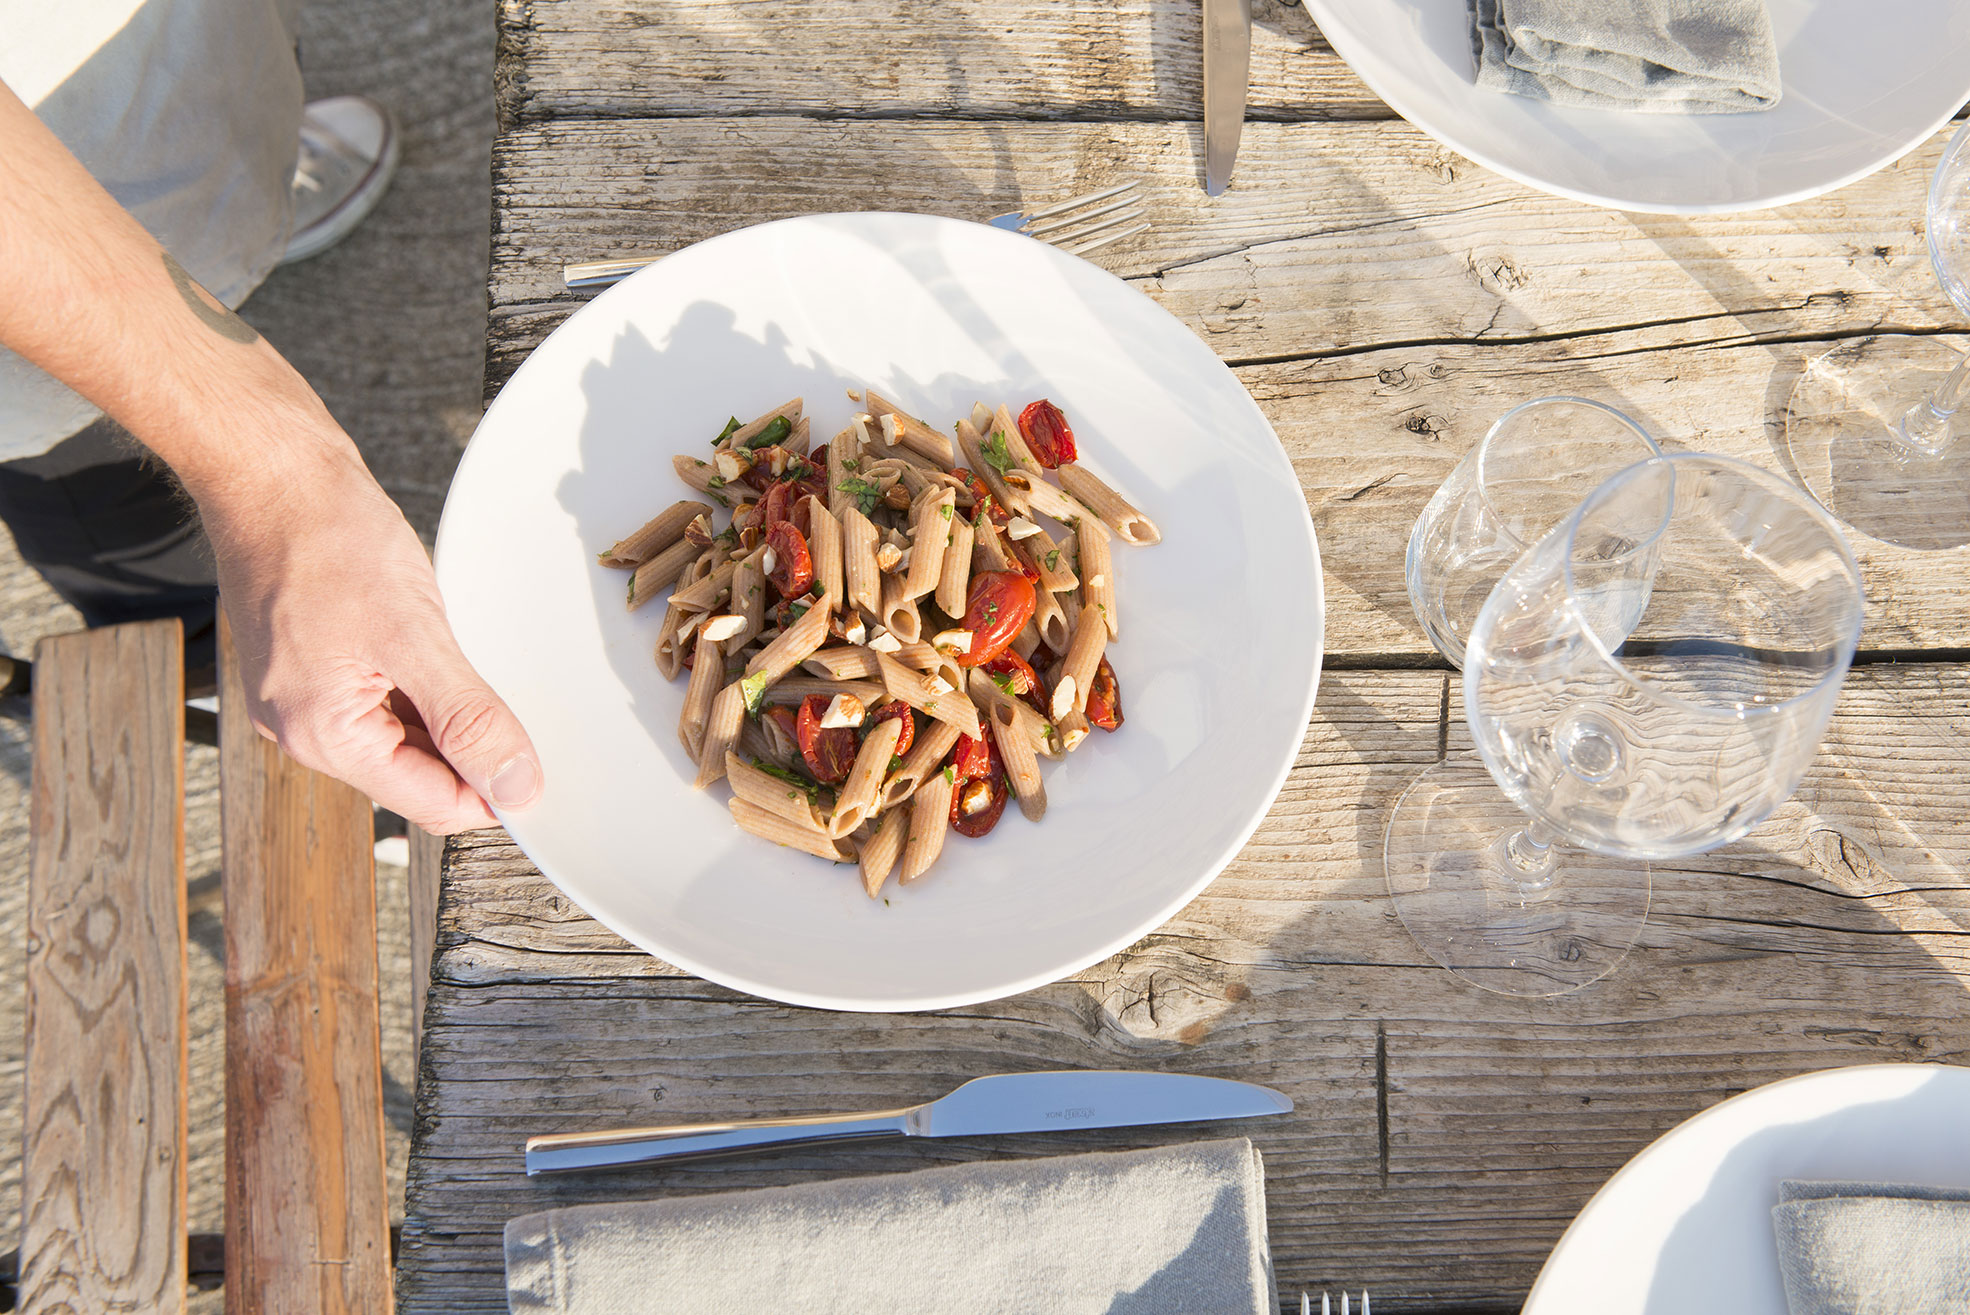 Pasta dish at Malatetsa Maison de Charme in the marche hills Photographer Maria Teresa Furnari